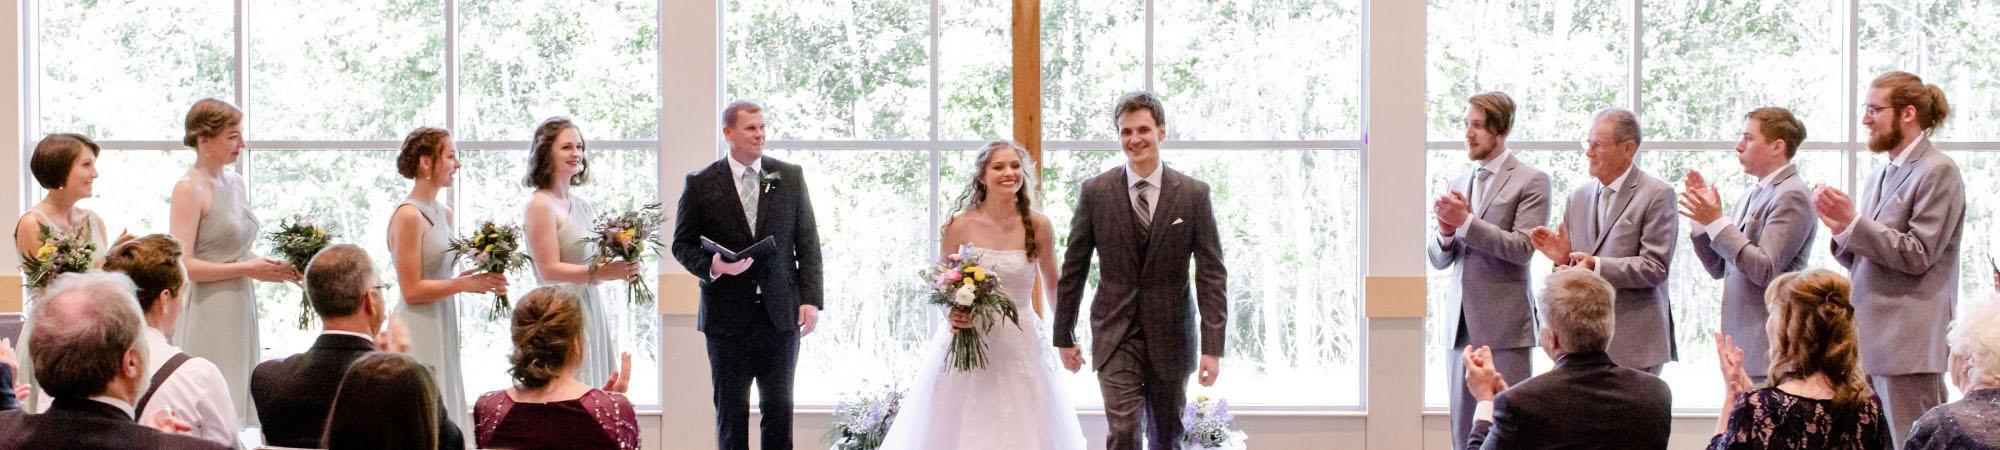 Braham Center Wedding Photographs of Receptions.